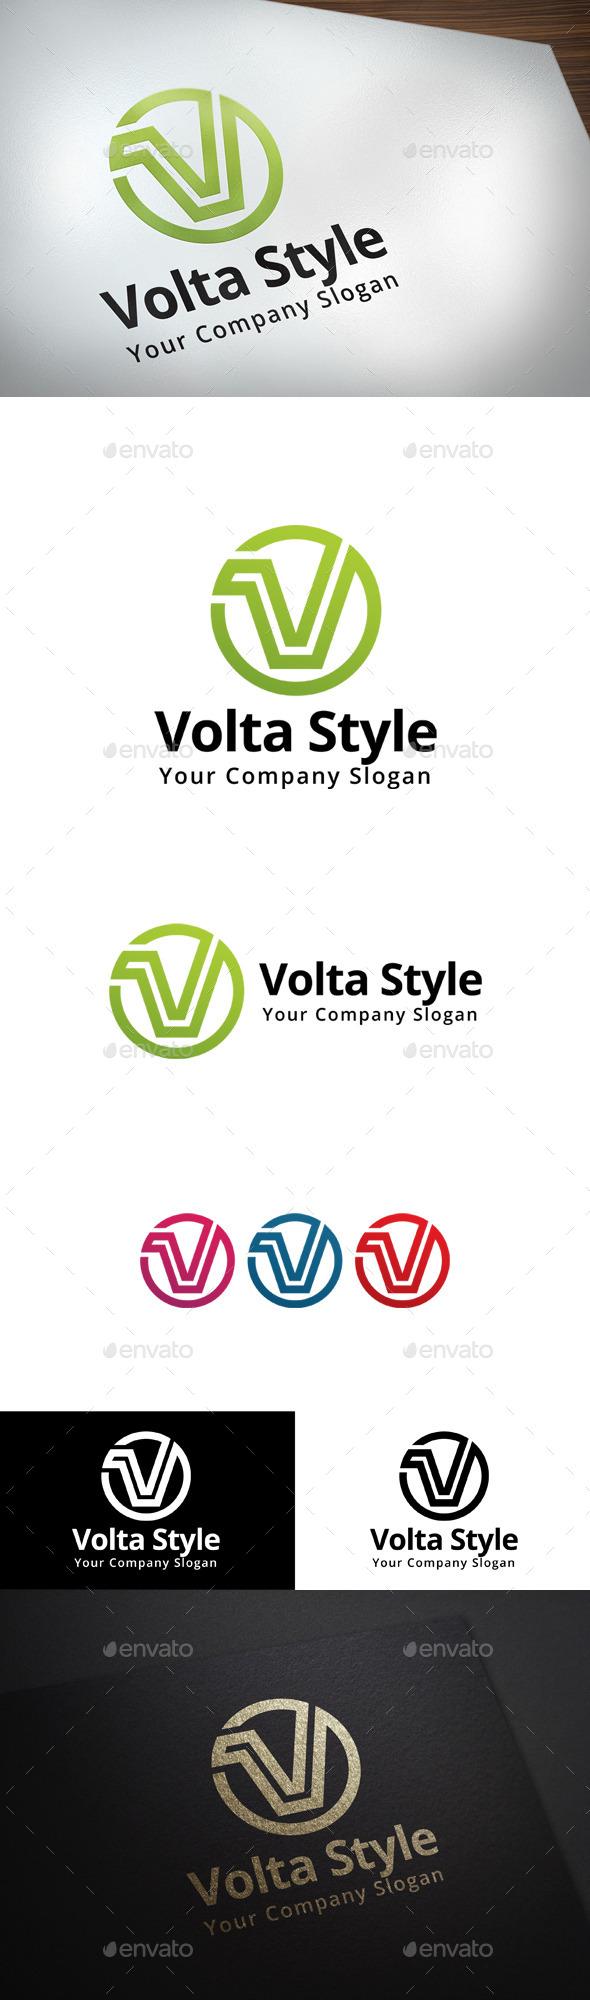 GraphicRiver Volta Style V Letter Logo 11392391